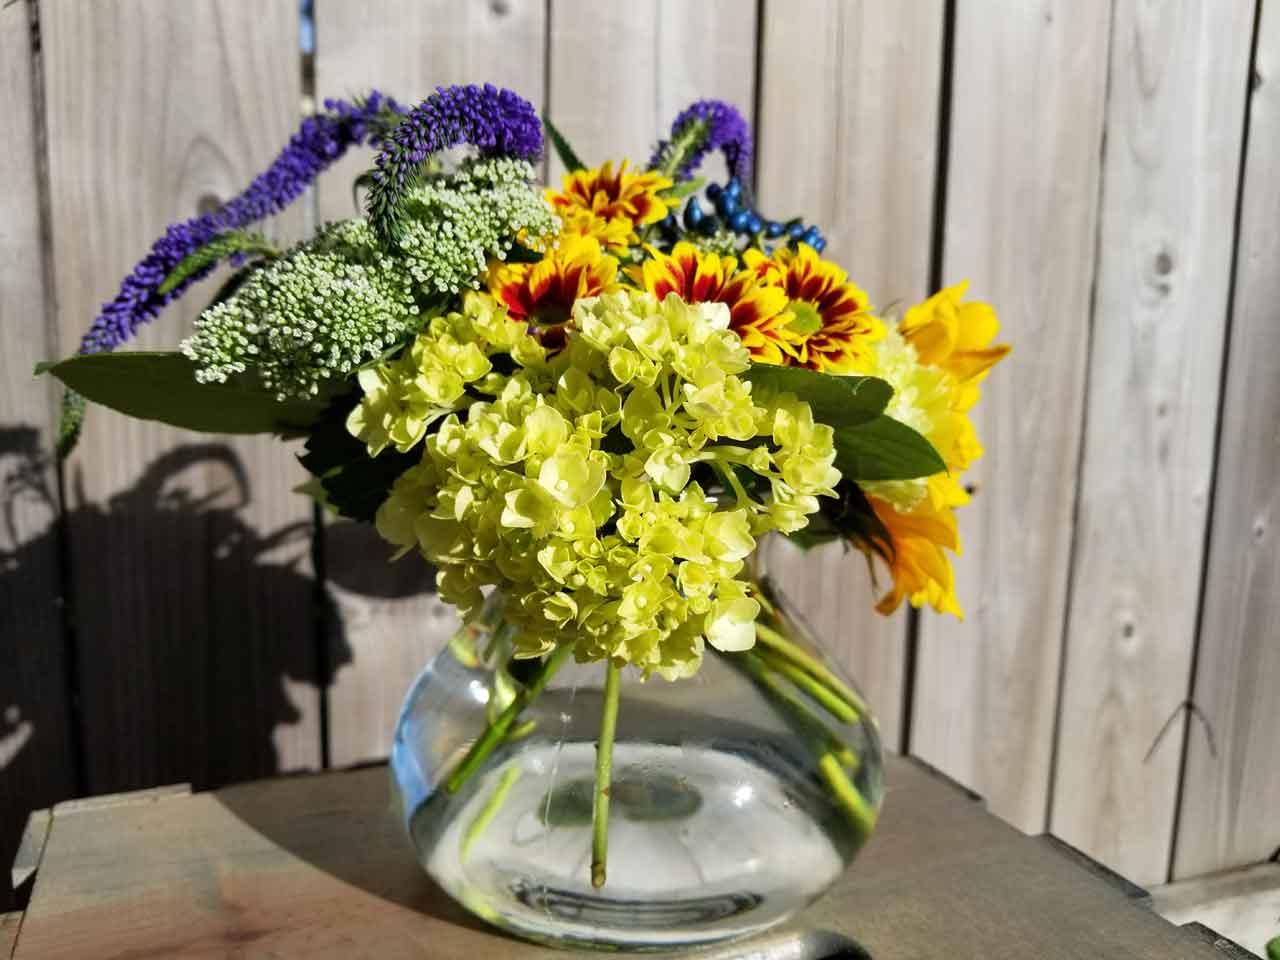 The Delicate Flower Colourful Personal Floral Arrangement